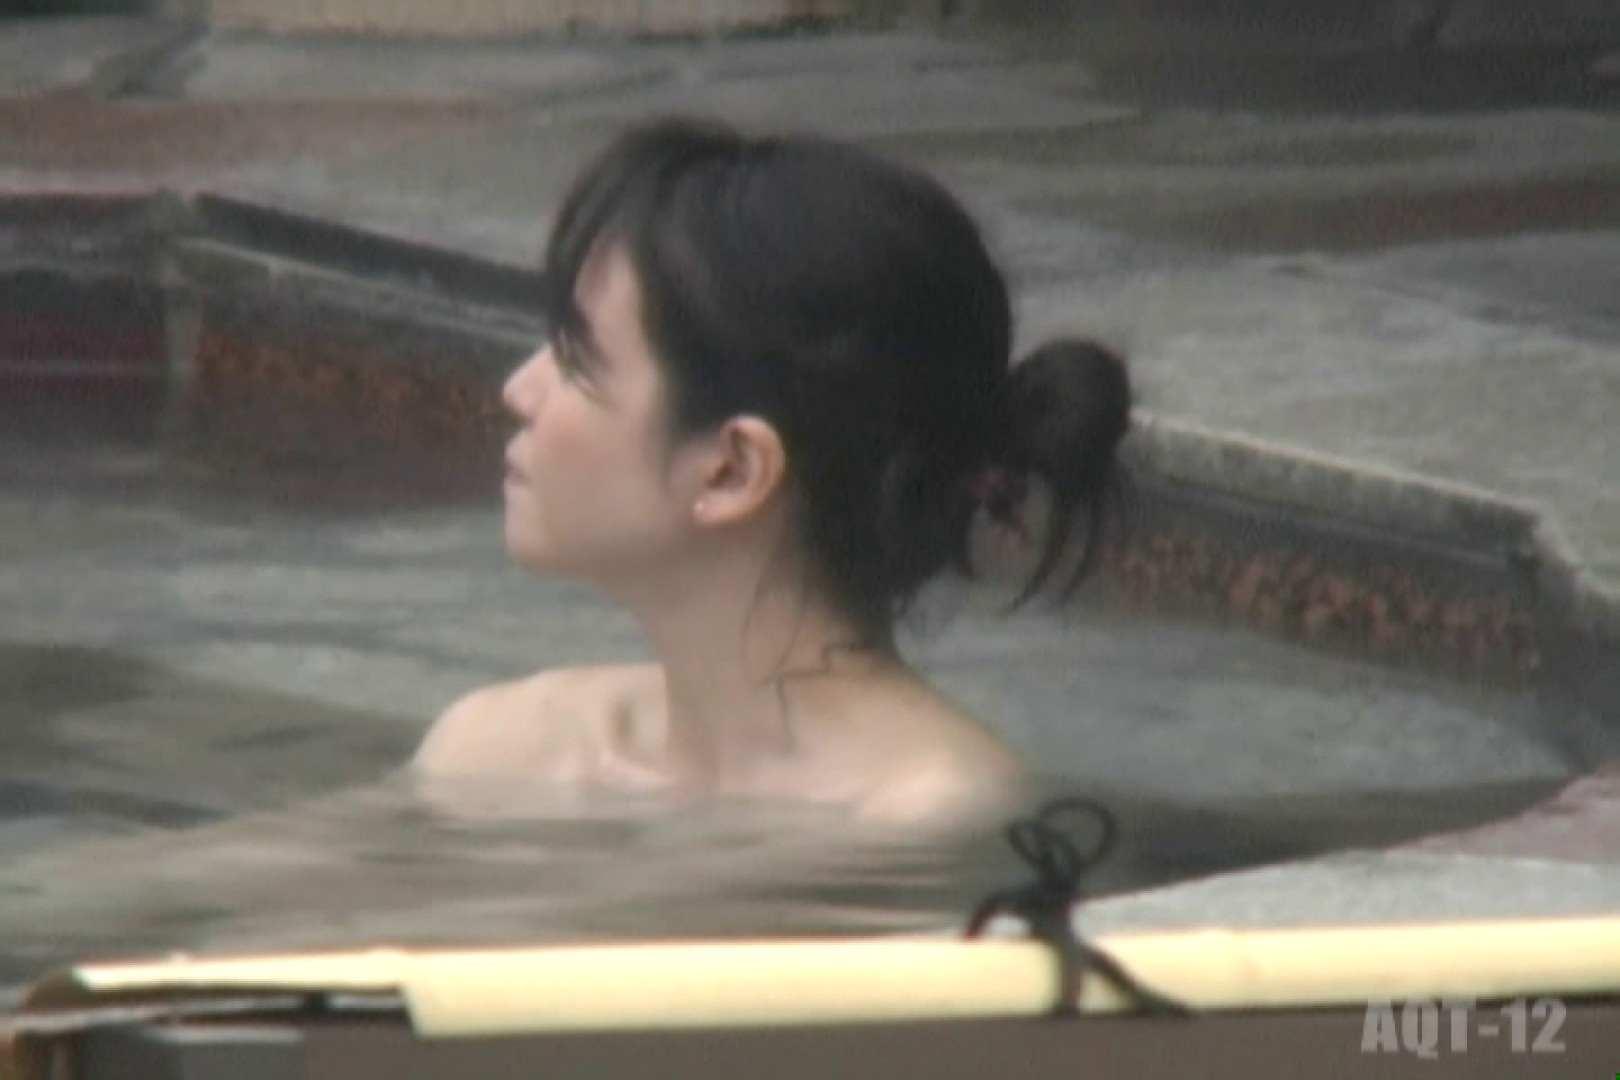 Aquaな露天風呂Vol.811 盗撮特撮 オメコ無修正動画無料 11pic 5